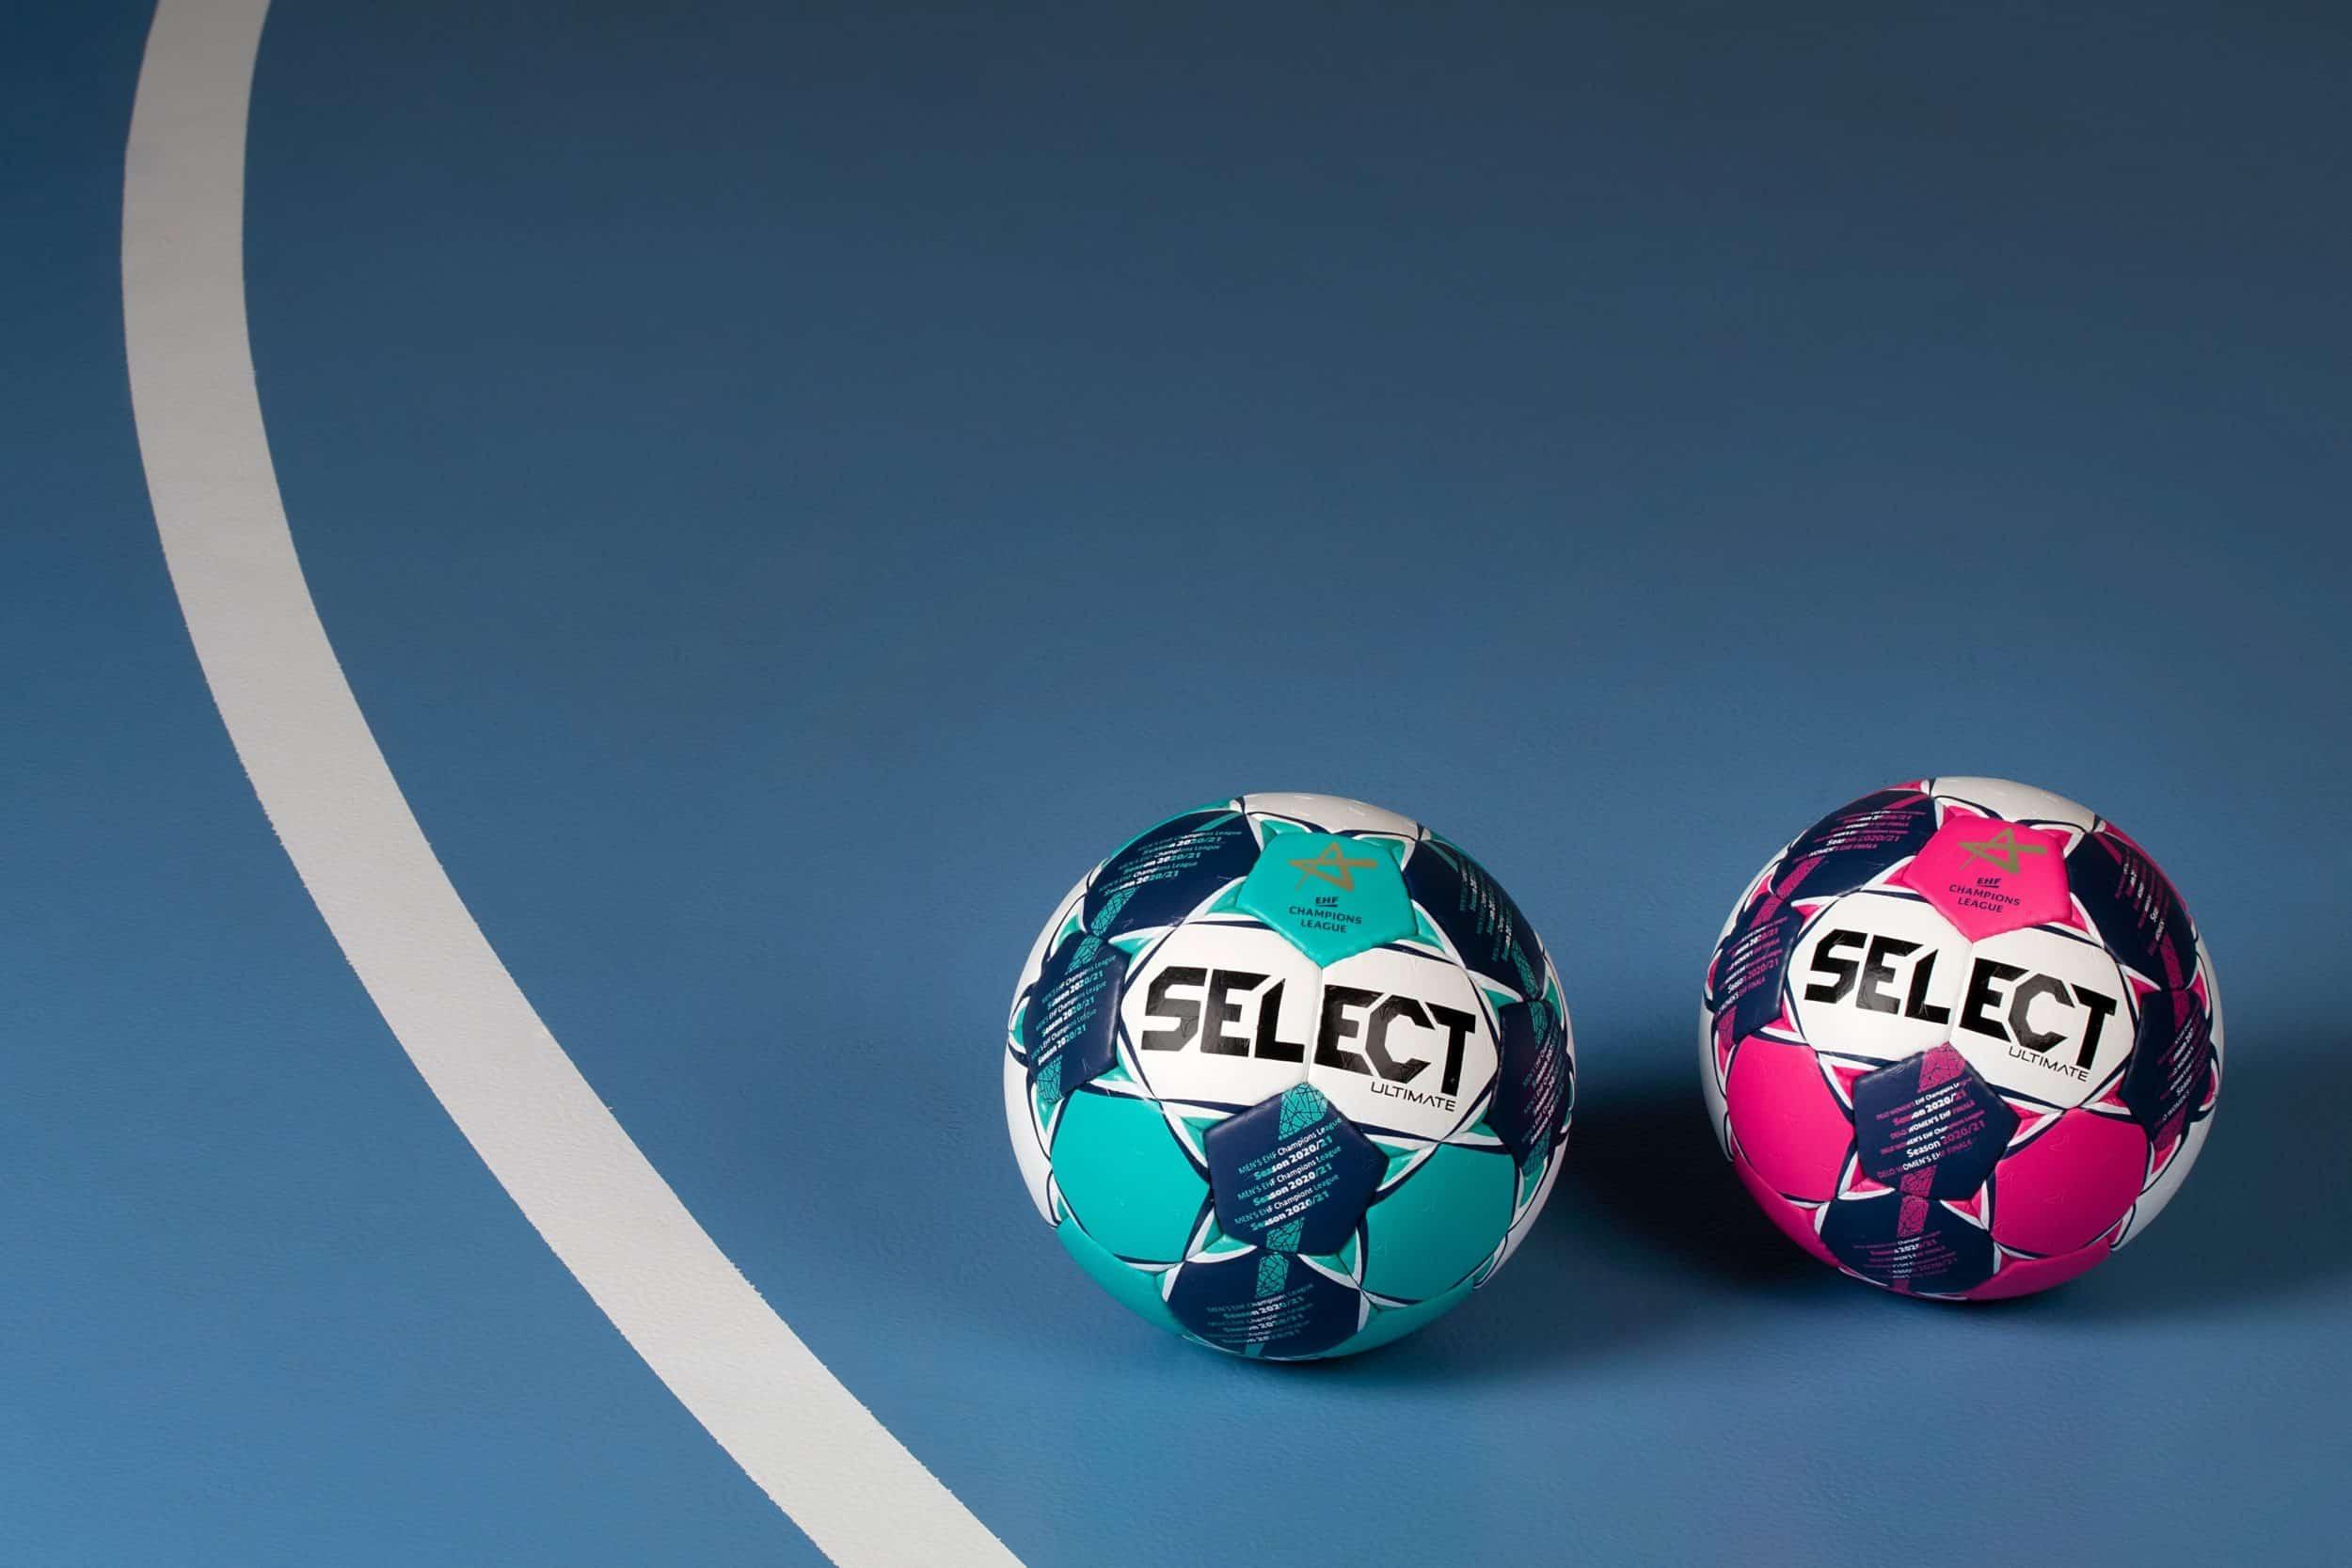 ballon-hand-select-ultimate-EHF-champions-league-2020-2021-1